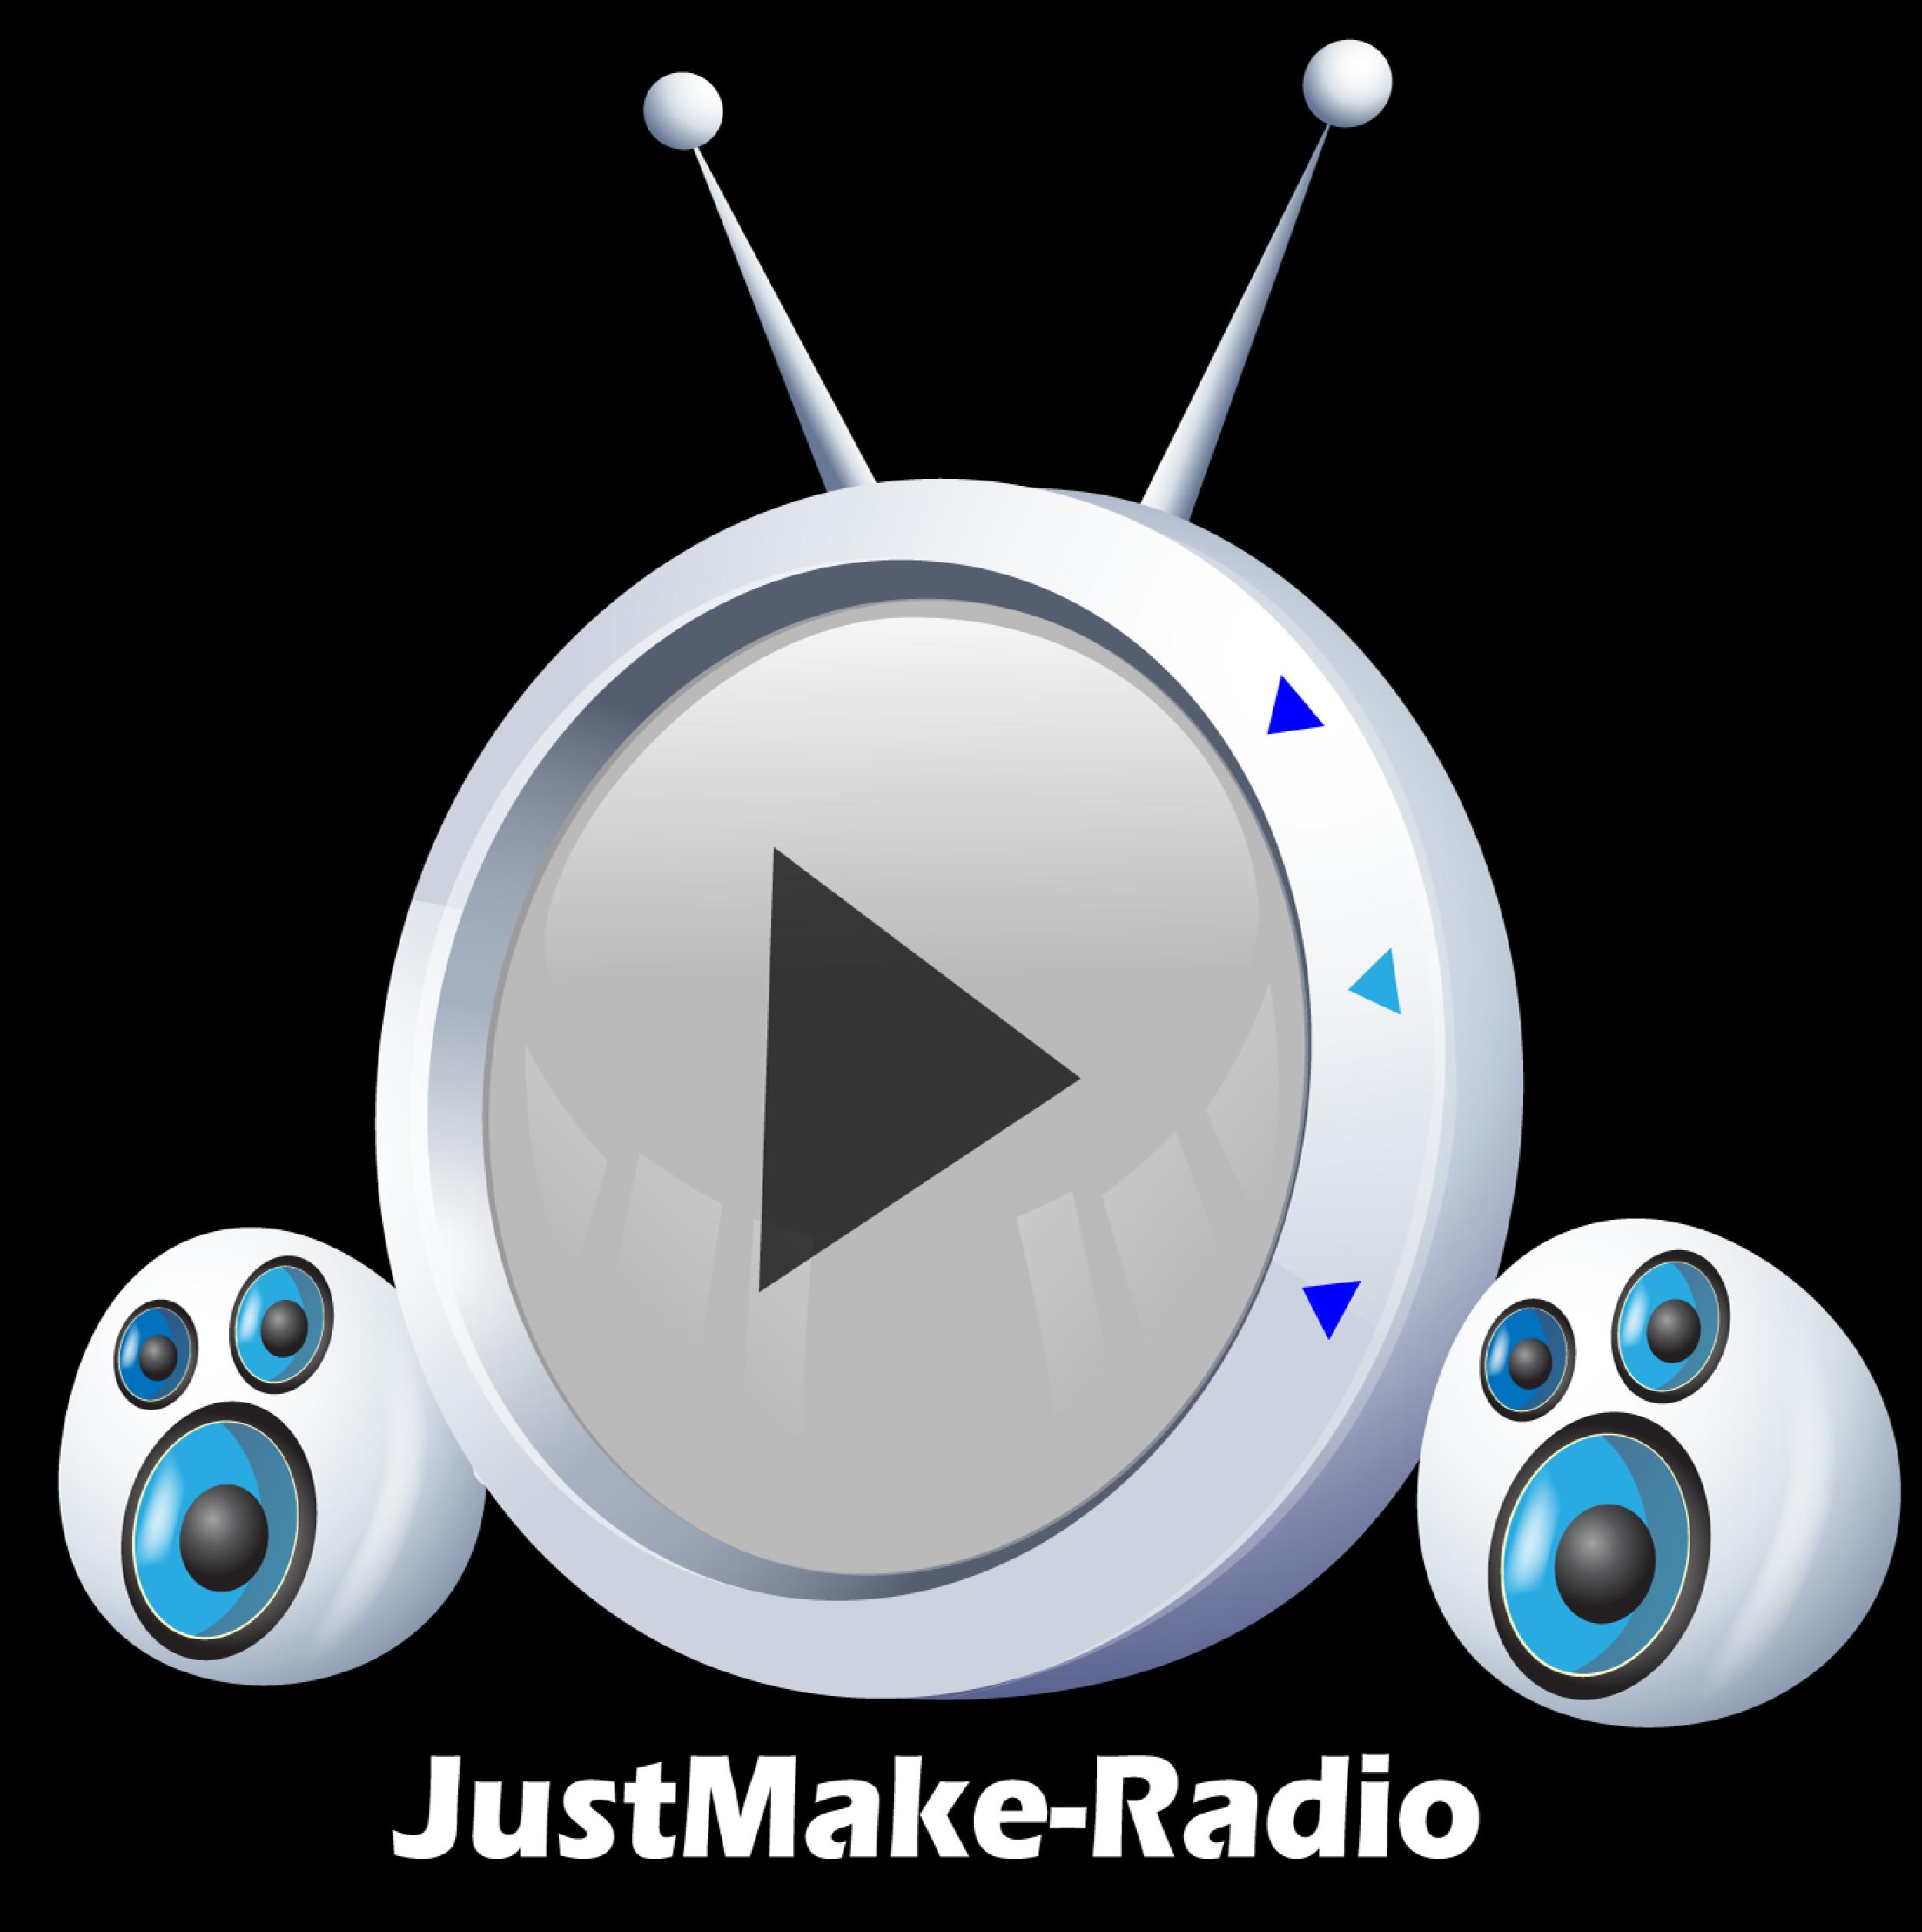 JustMake-Radio